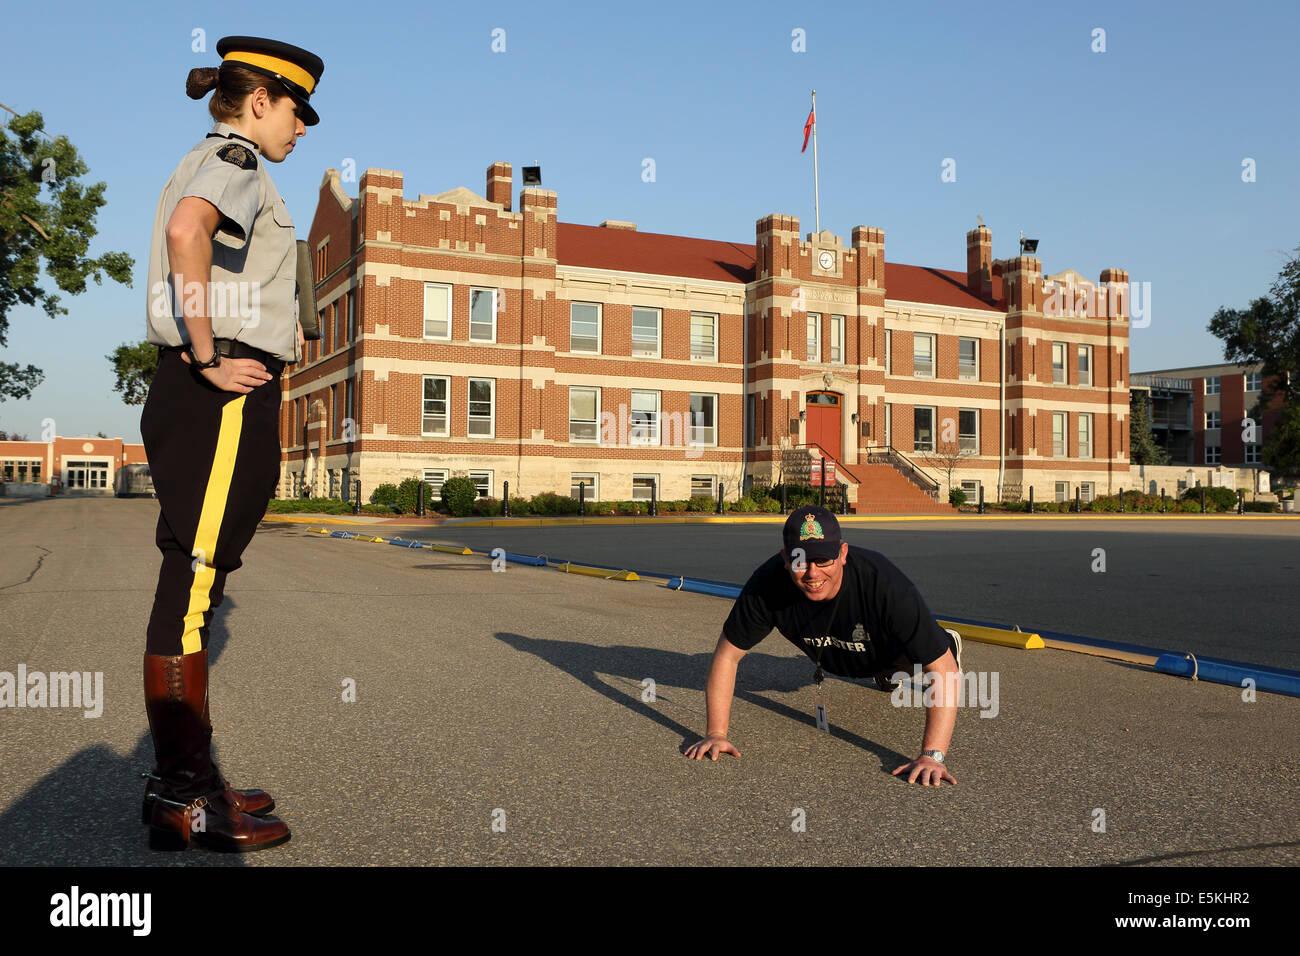 Police Training: Royal Canadian Mounted Police Training